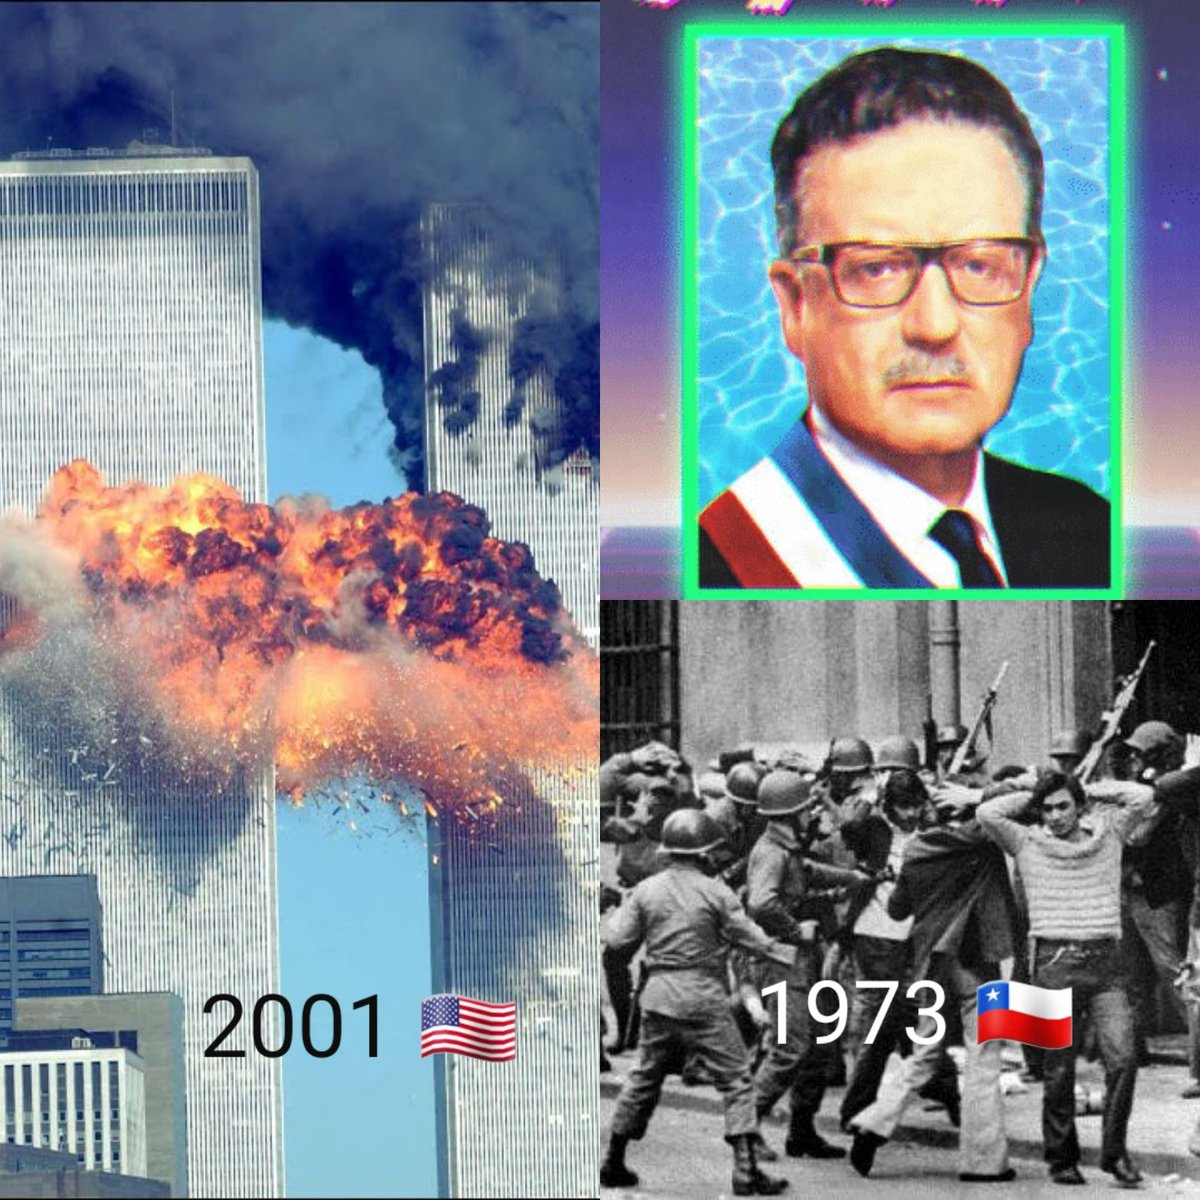 #USA #Chile #Latin_America #Terrorism #Civil_right #911Remembered #Chicken_hawk May peace & freedom forever! 😢 #Remember_911 😢 #Fuck_Pinochet 🖕🏻🤬 #NO_terrorism_BUT_also_say_NO_to_chickenhawk https://t.co/bVQlZguPoa